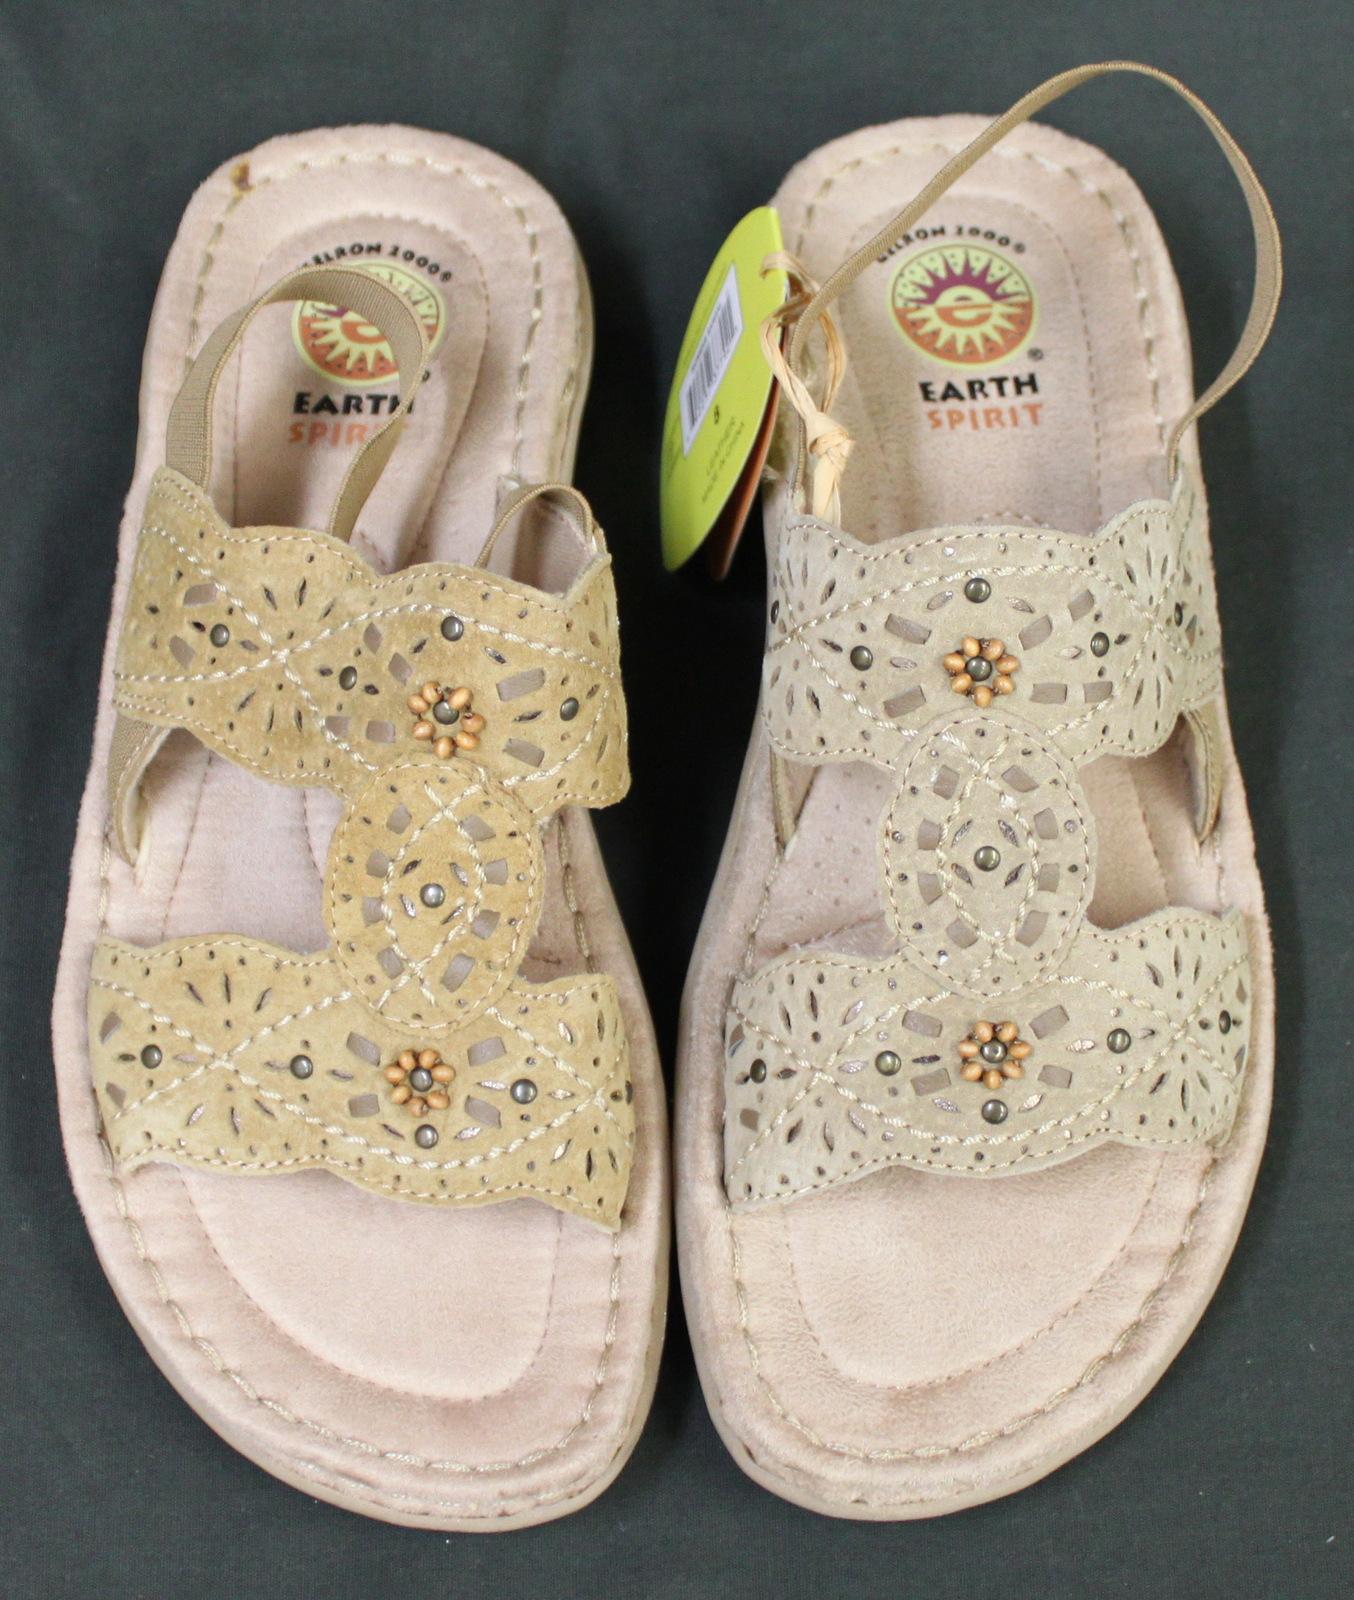 Womens Earth Spirit Leather Sandals Gelron 2000 - Sandals  Flip Flops-8432